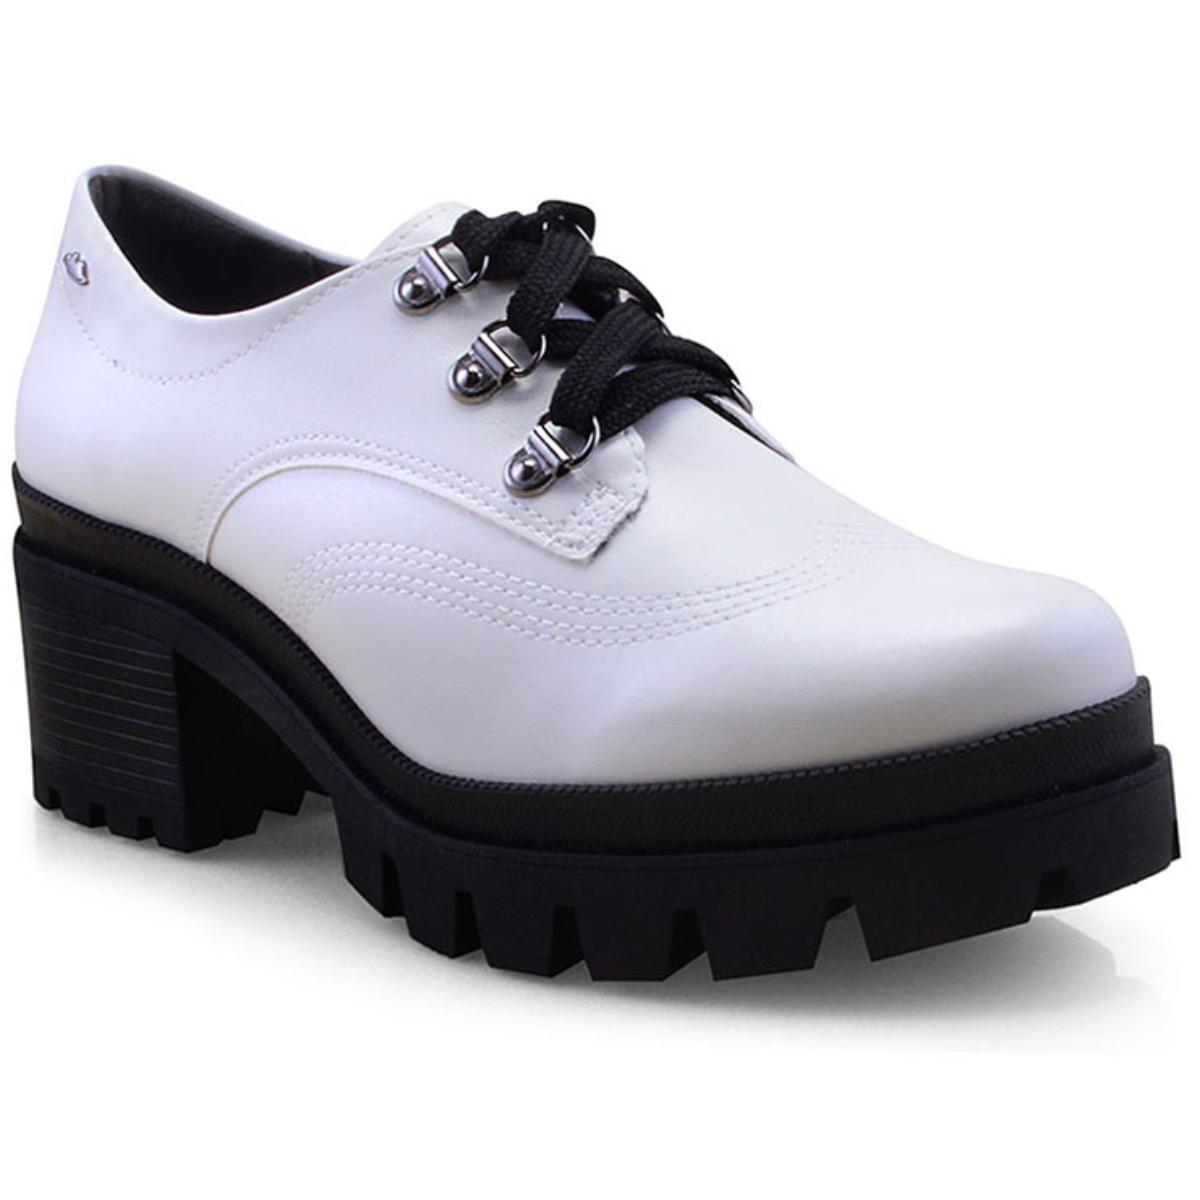 Sapato Feminino Dakota G1351 Branco